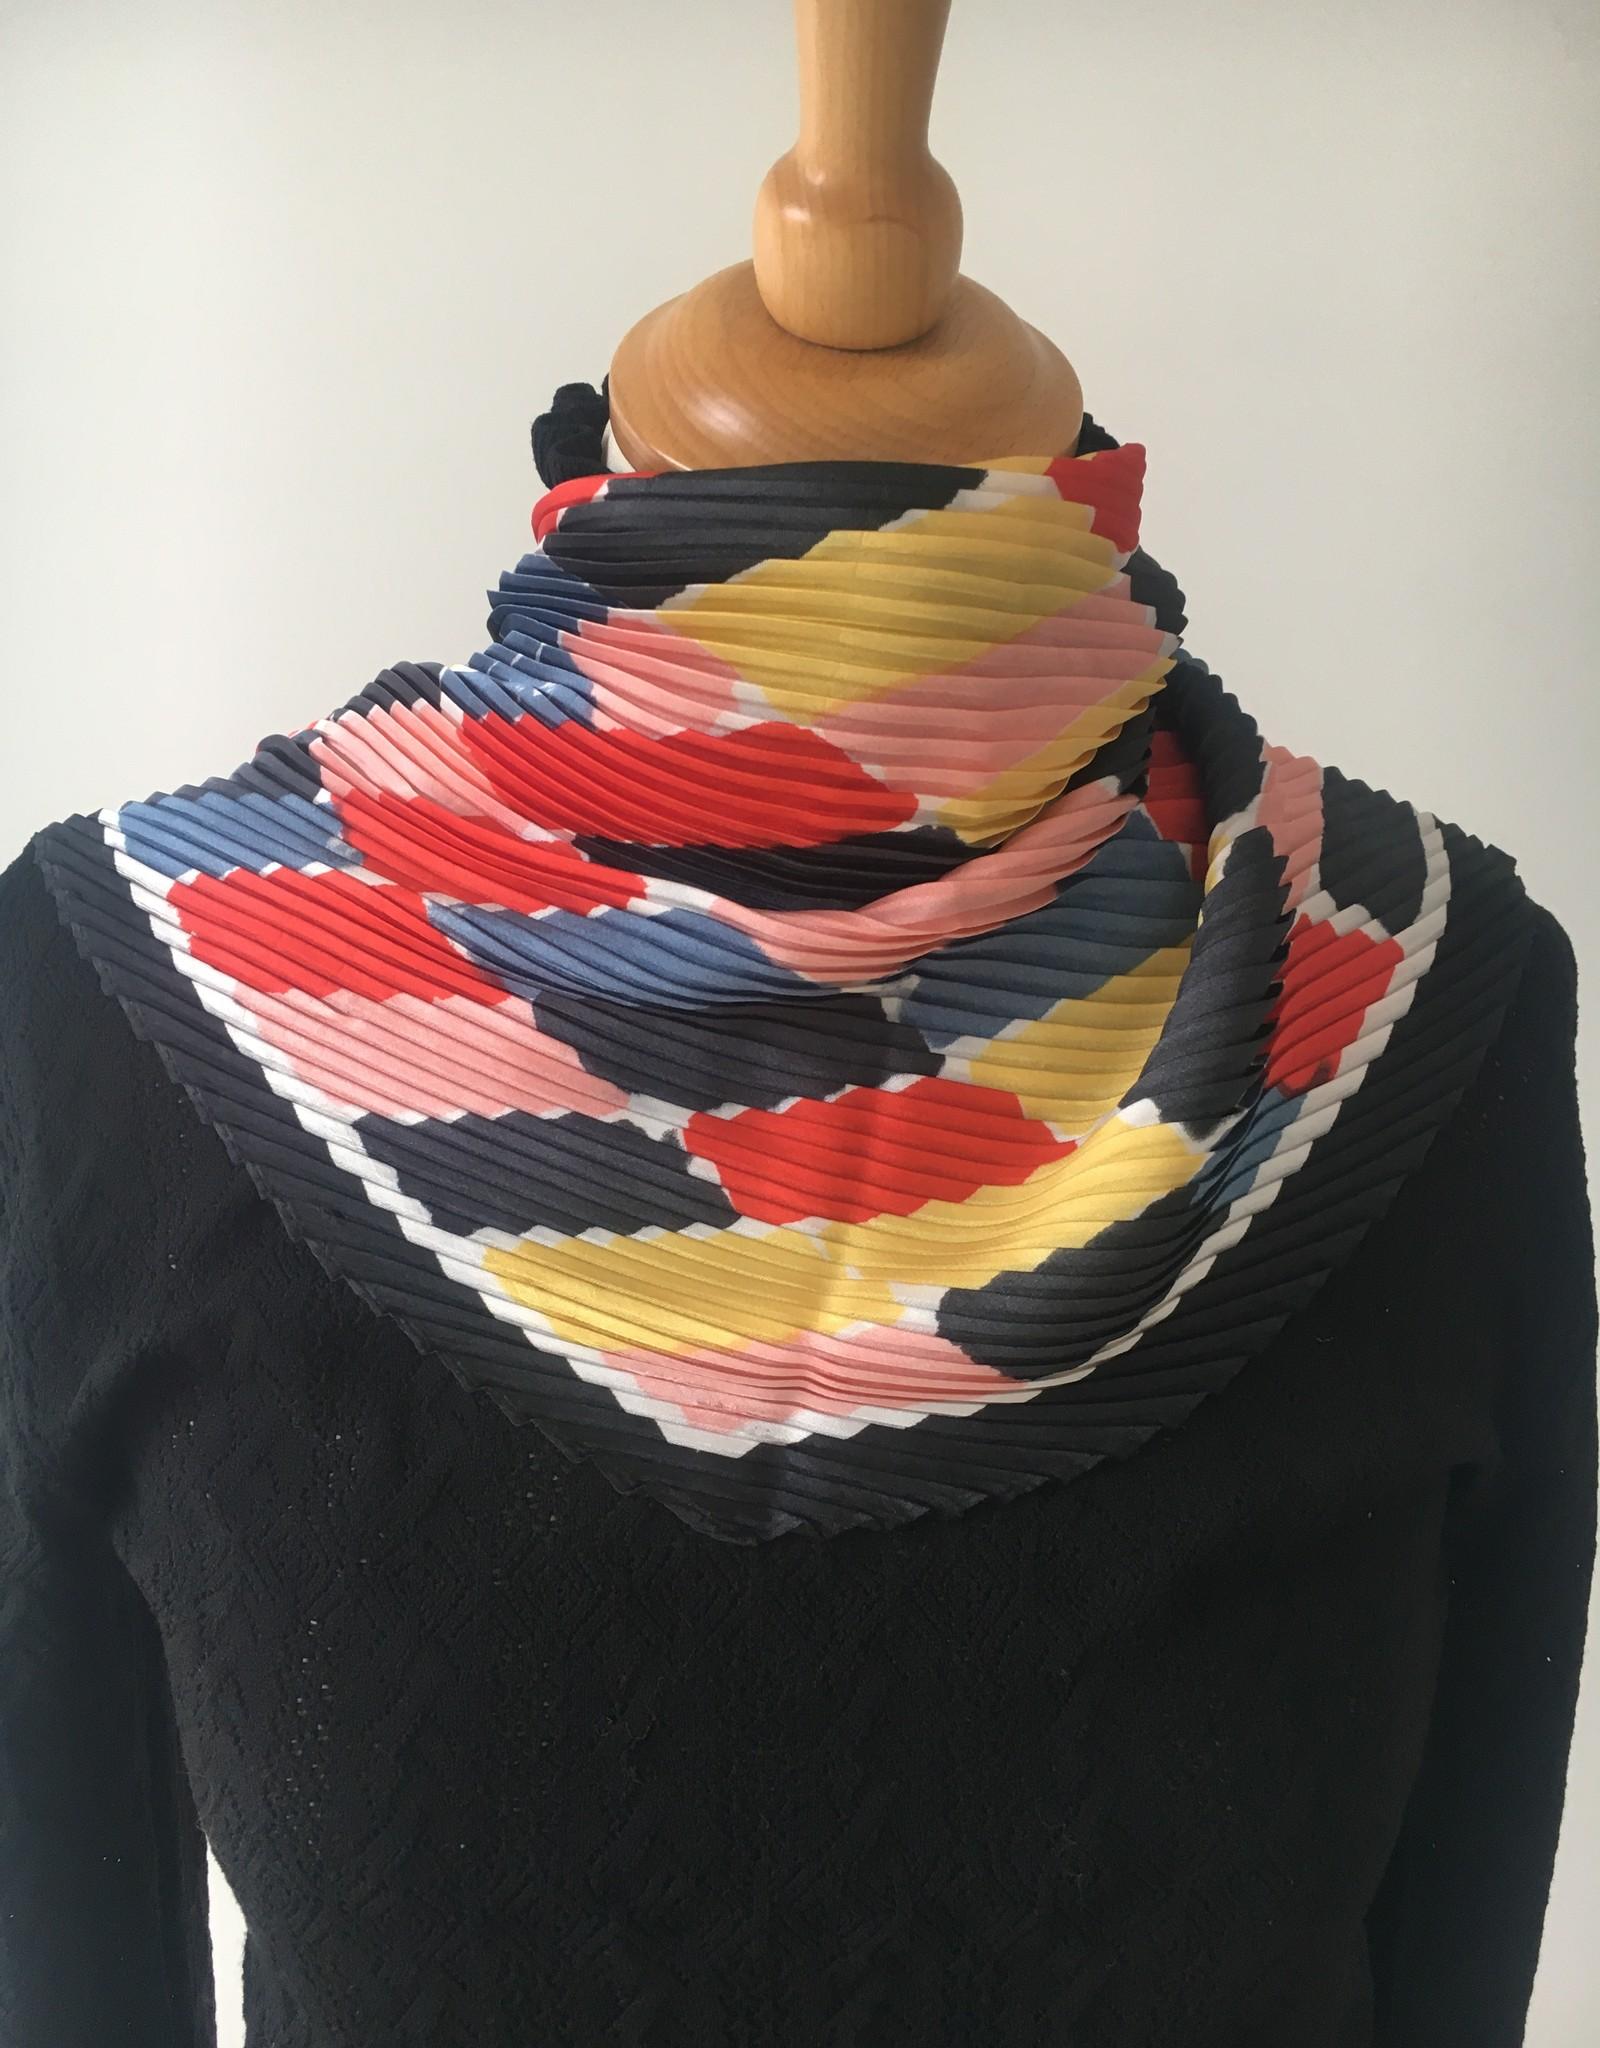 Bandana in Satin, several colors